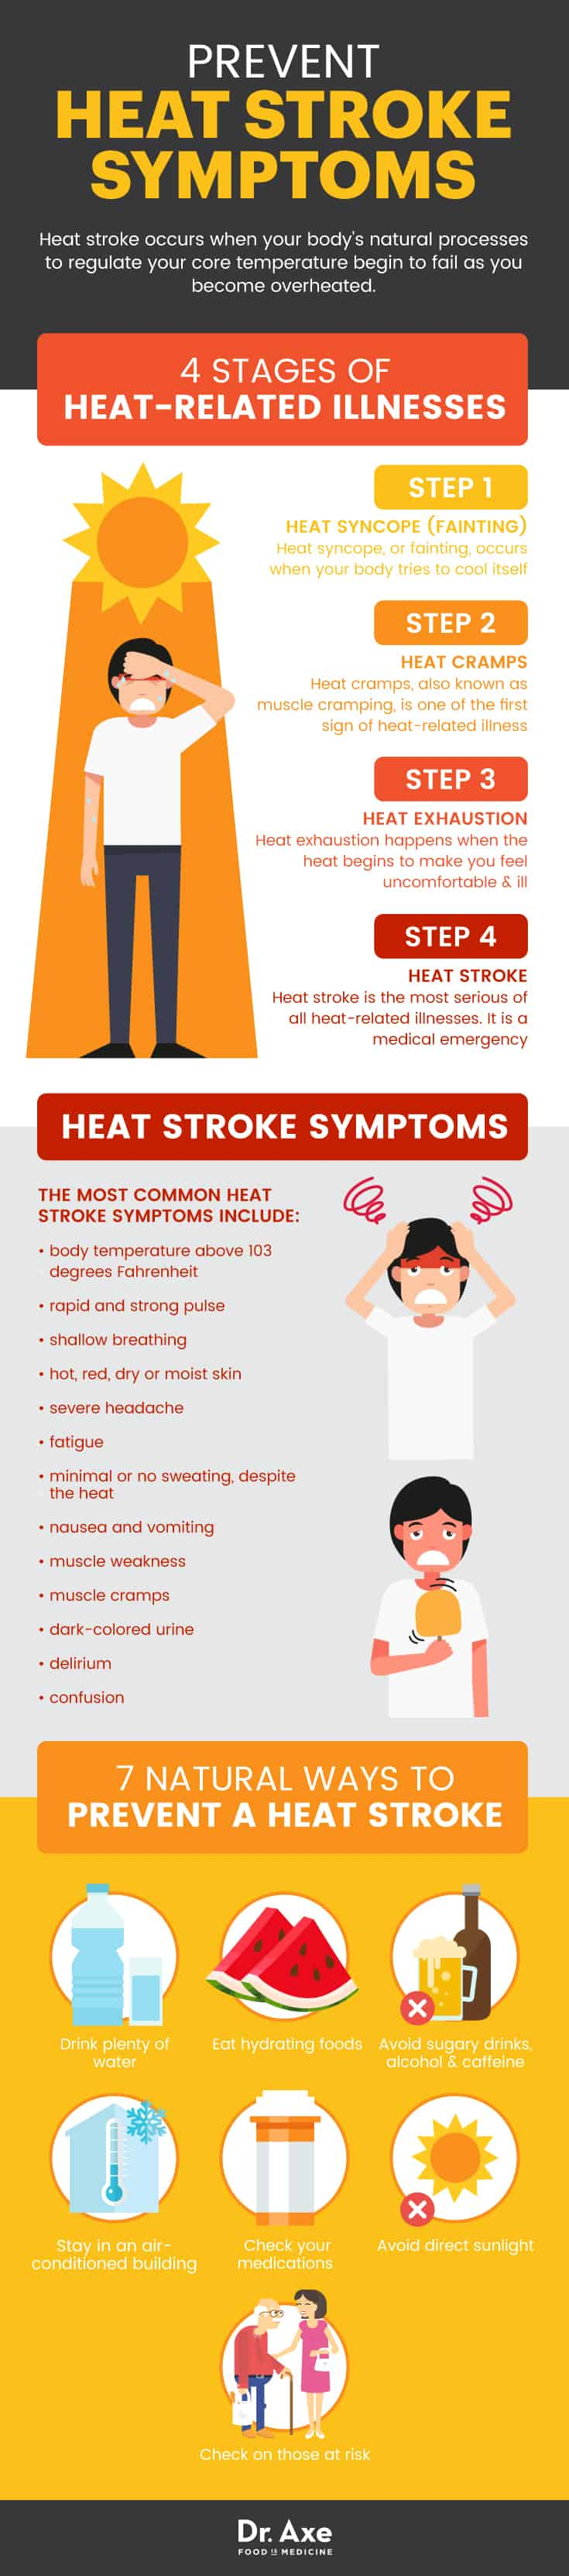 Prevent heat stroke symptoms - Dr. Axe